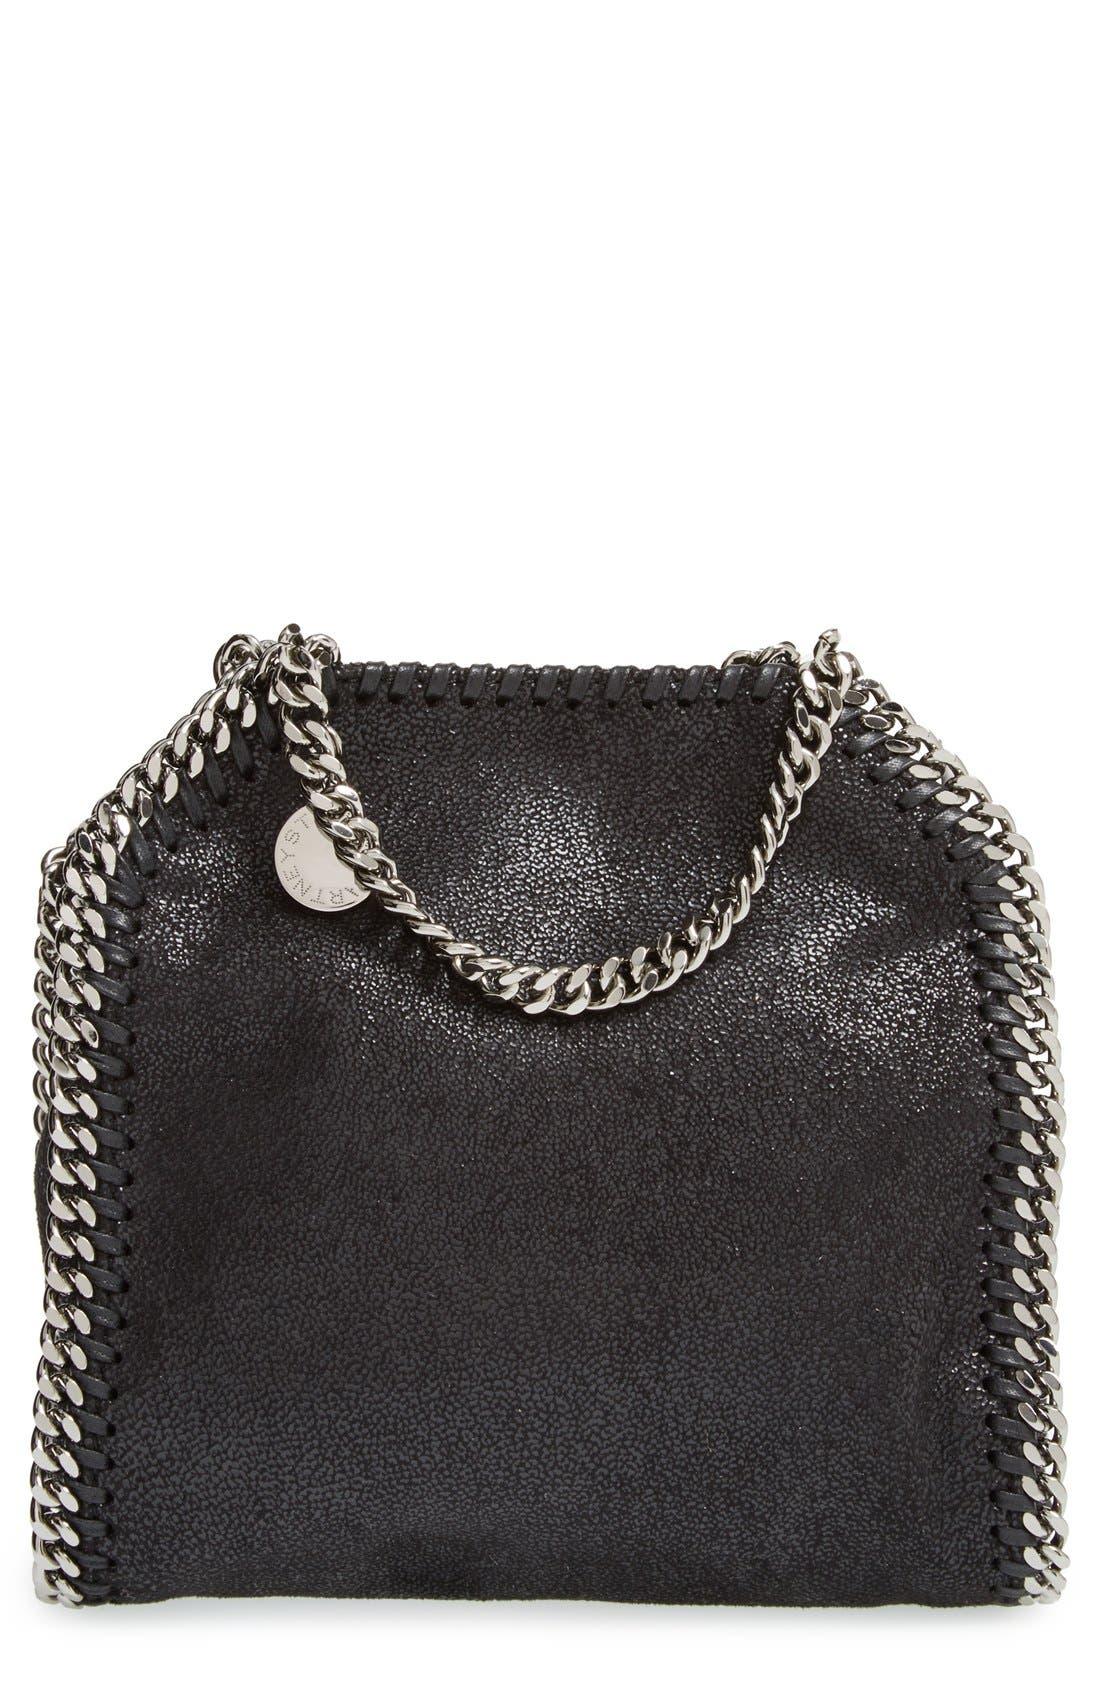 Stella McCartney 'Tiny Falabella' Faux Leather Crossbody Bag